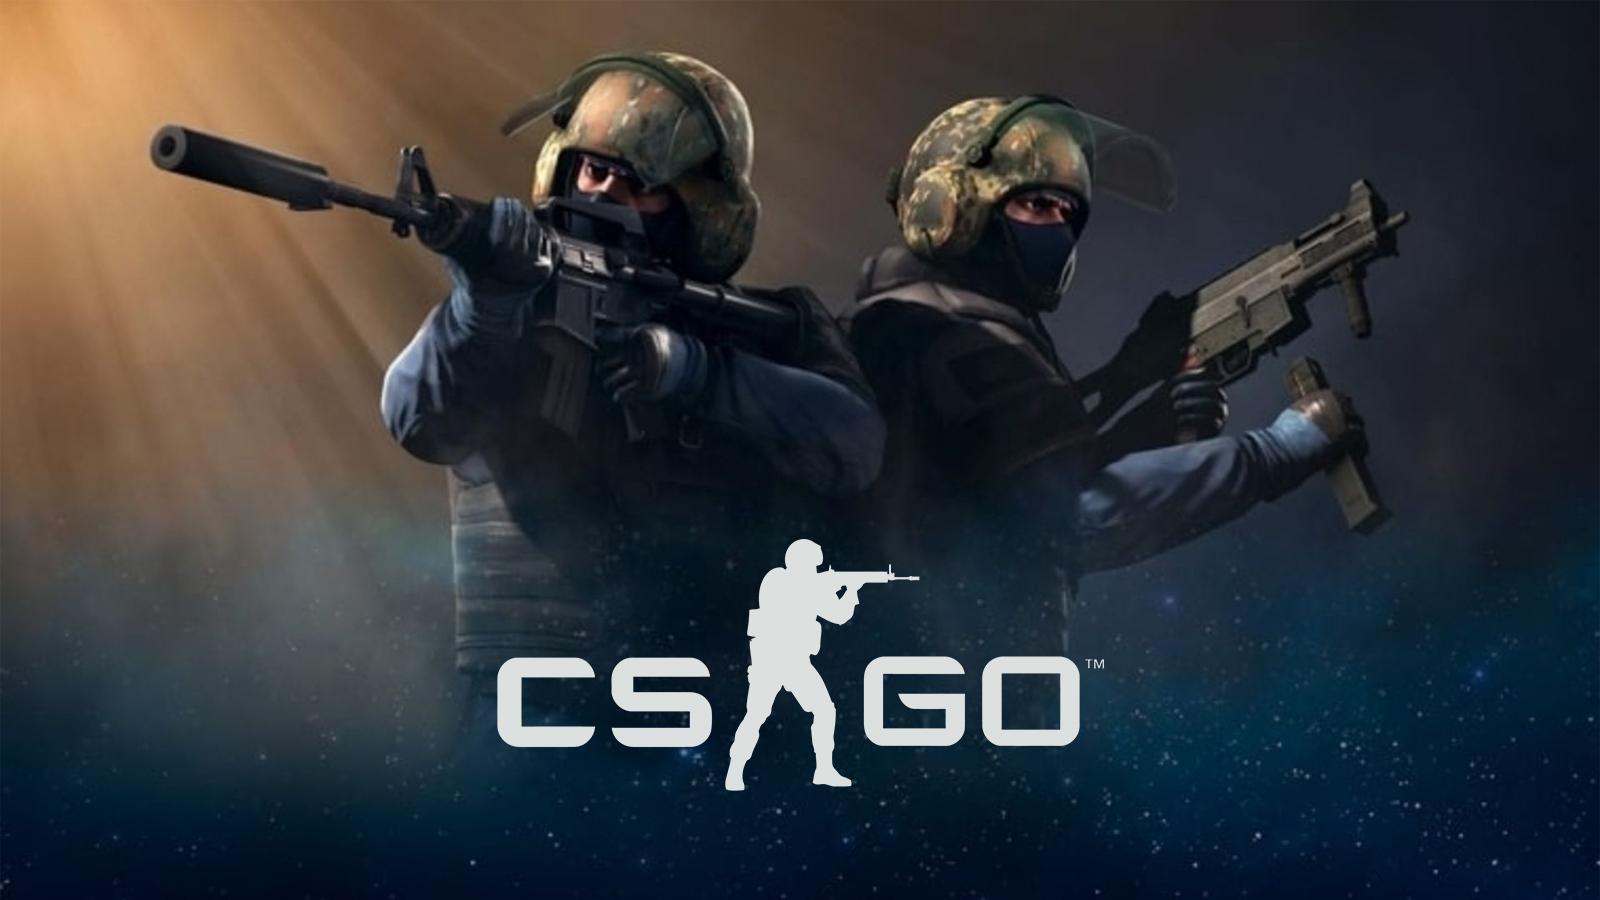 What is CSGO?